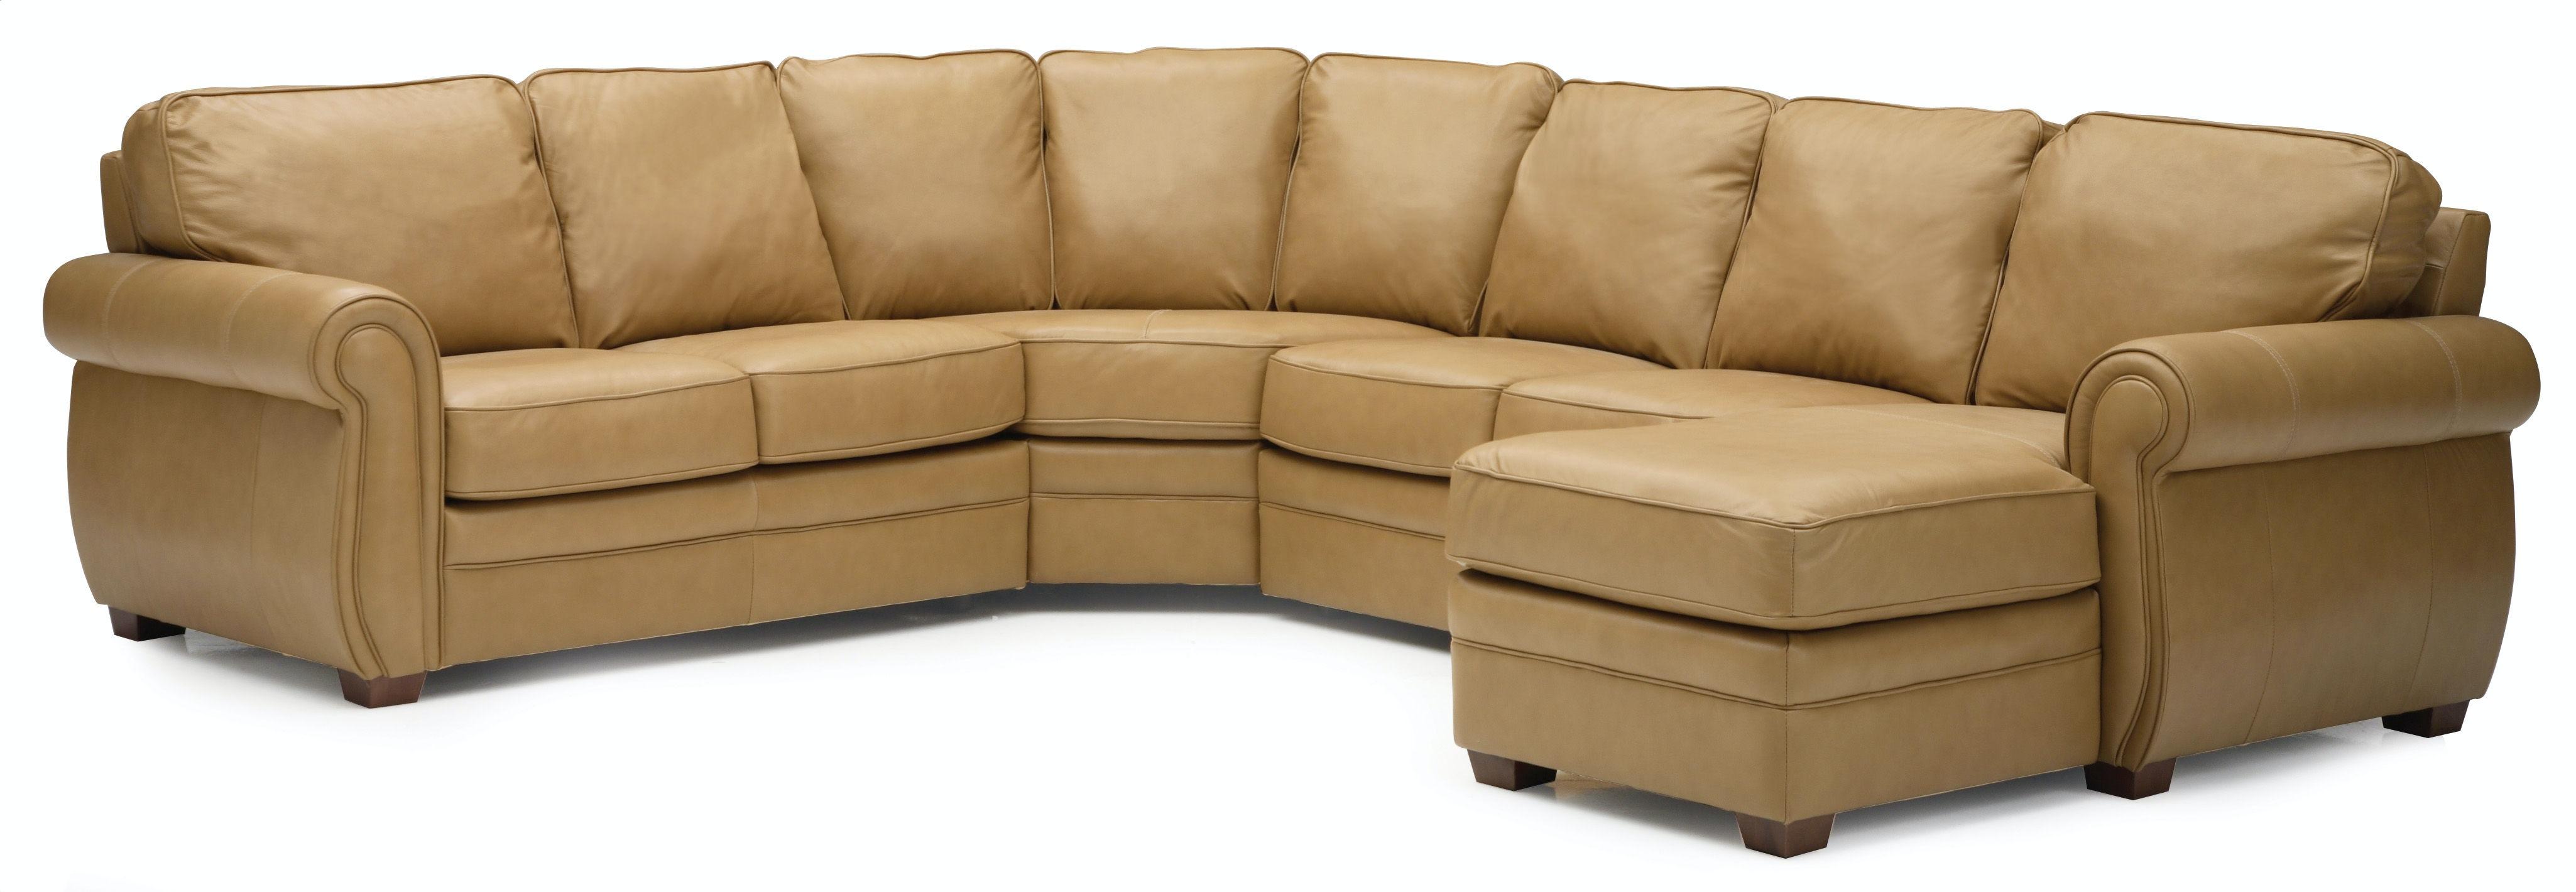 Alula Chair By Palliser Furniture Palliser Furniture Parkville